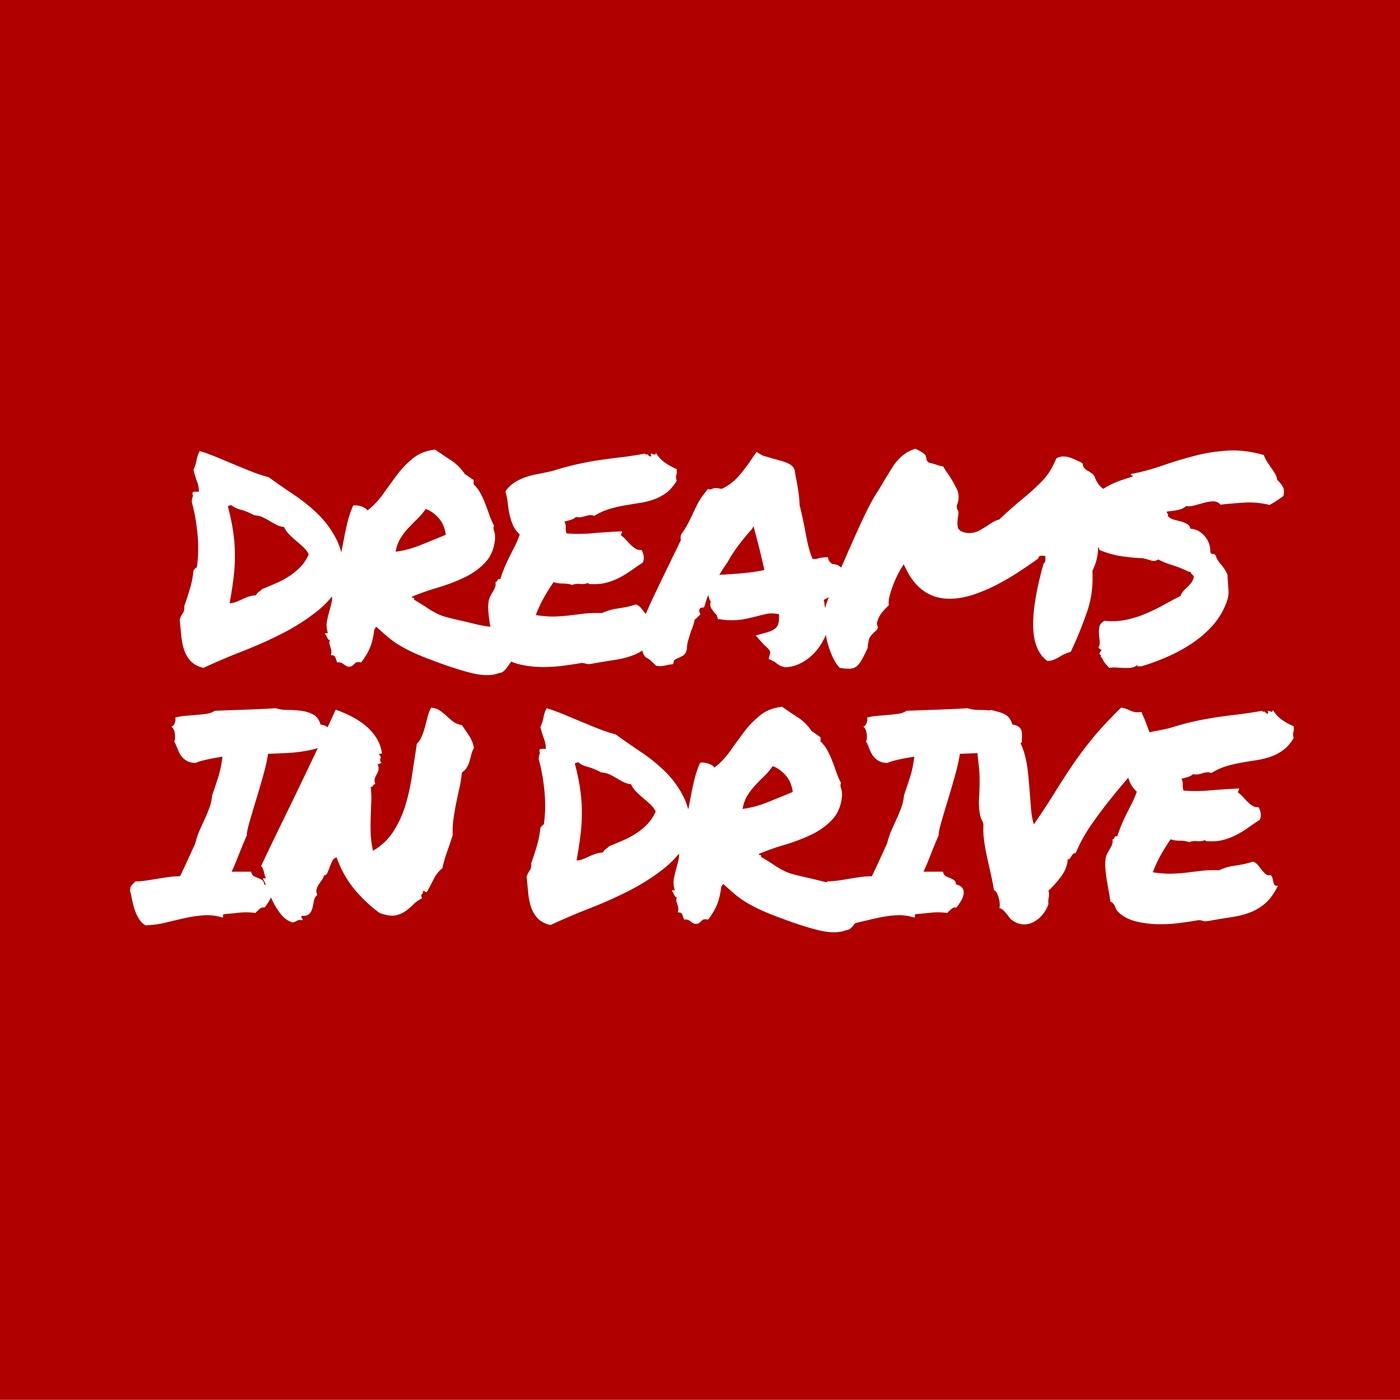 contact dreams in drive. Black Bedroom Furniture Sets. Home Design Ideas